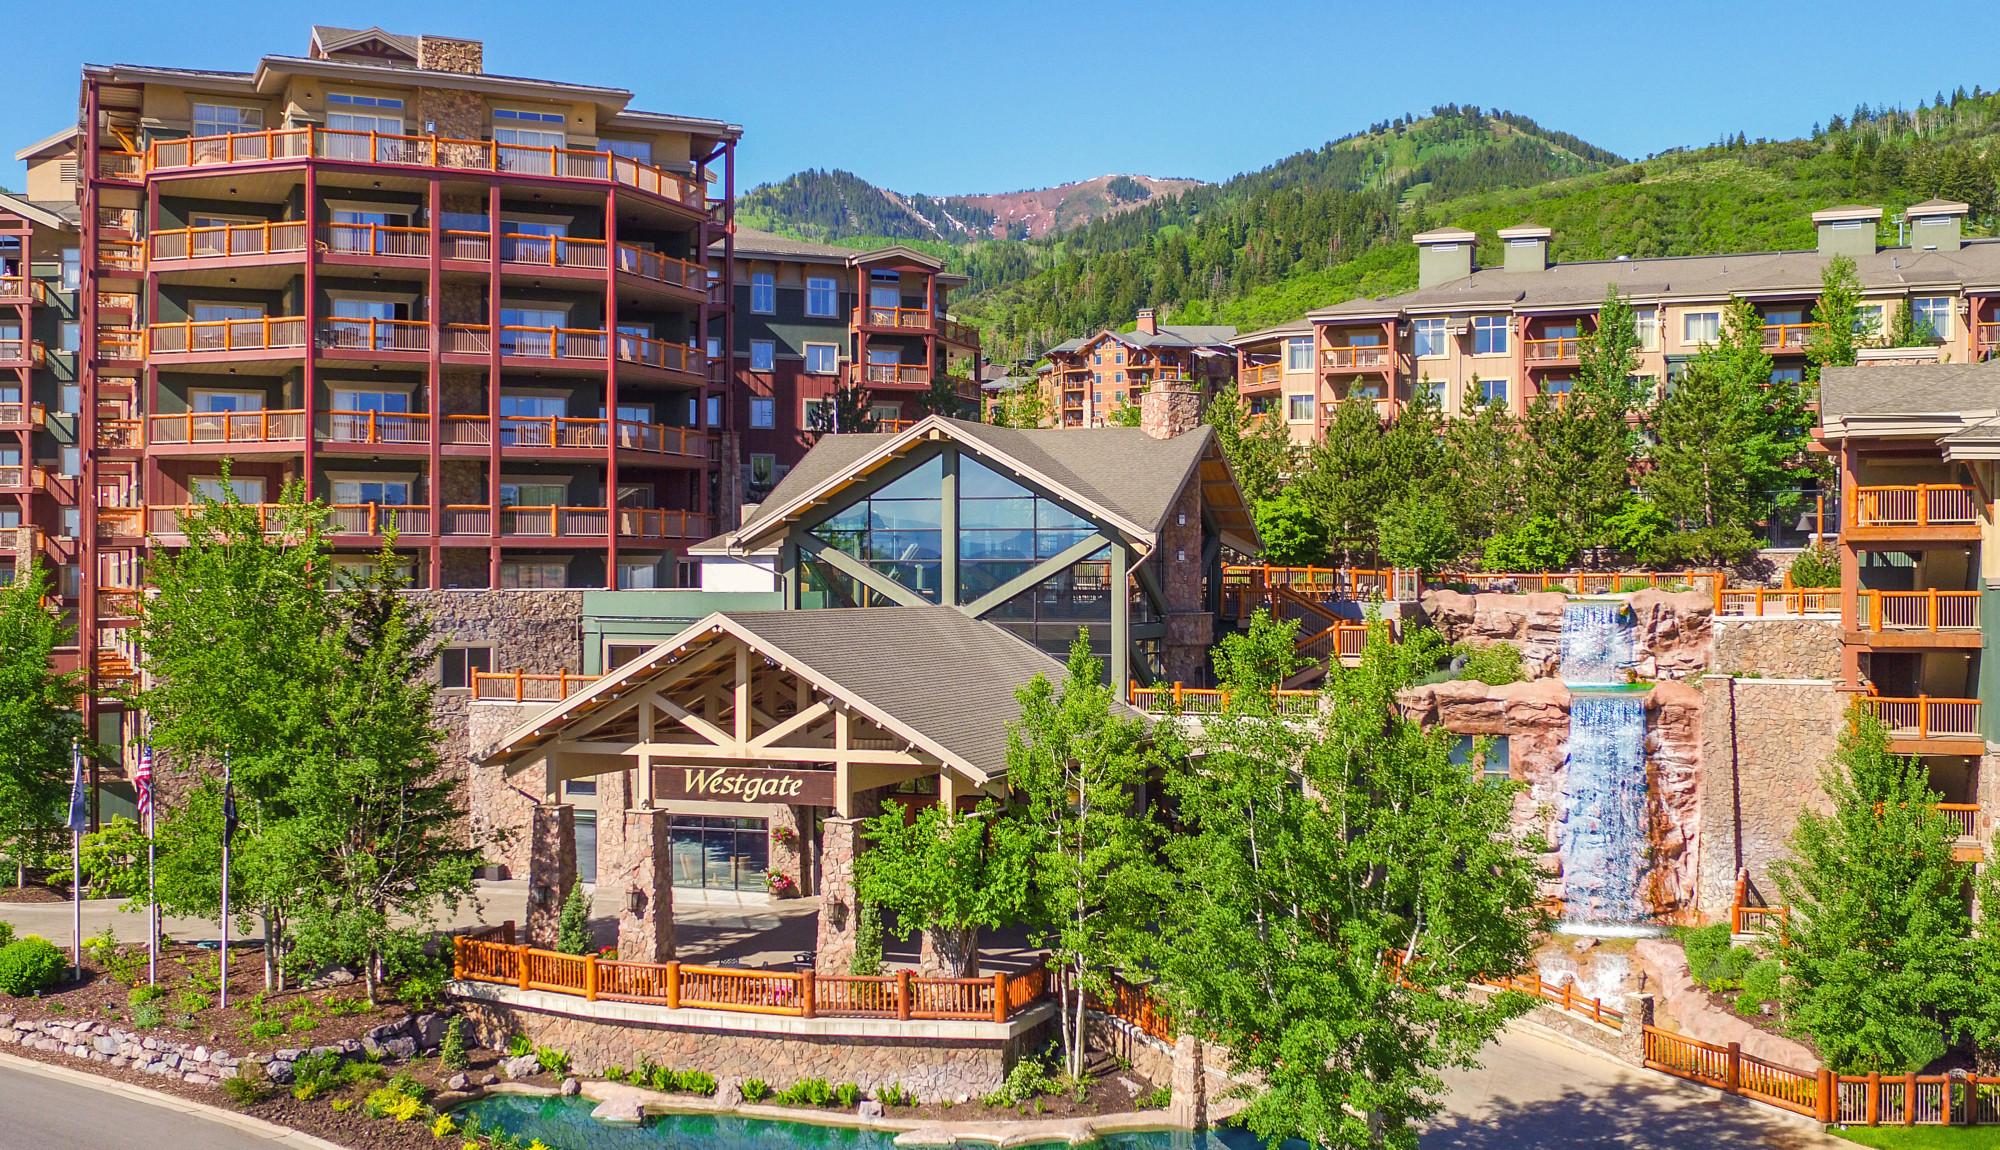 Park City Utah Photos - Westgate Park City Resort Luxury